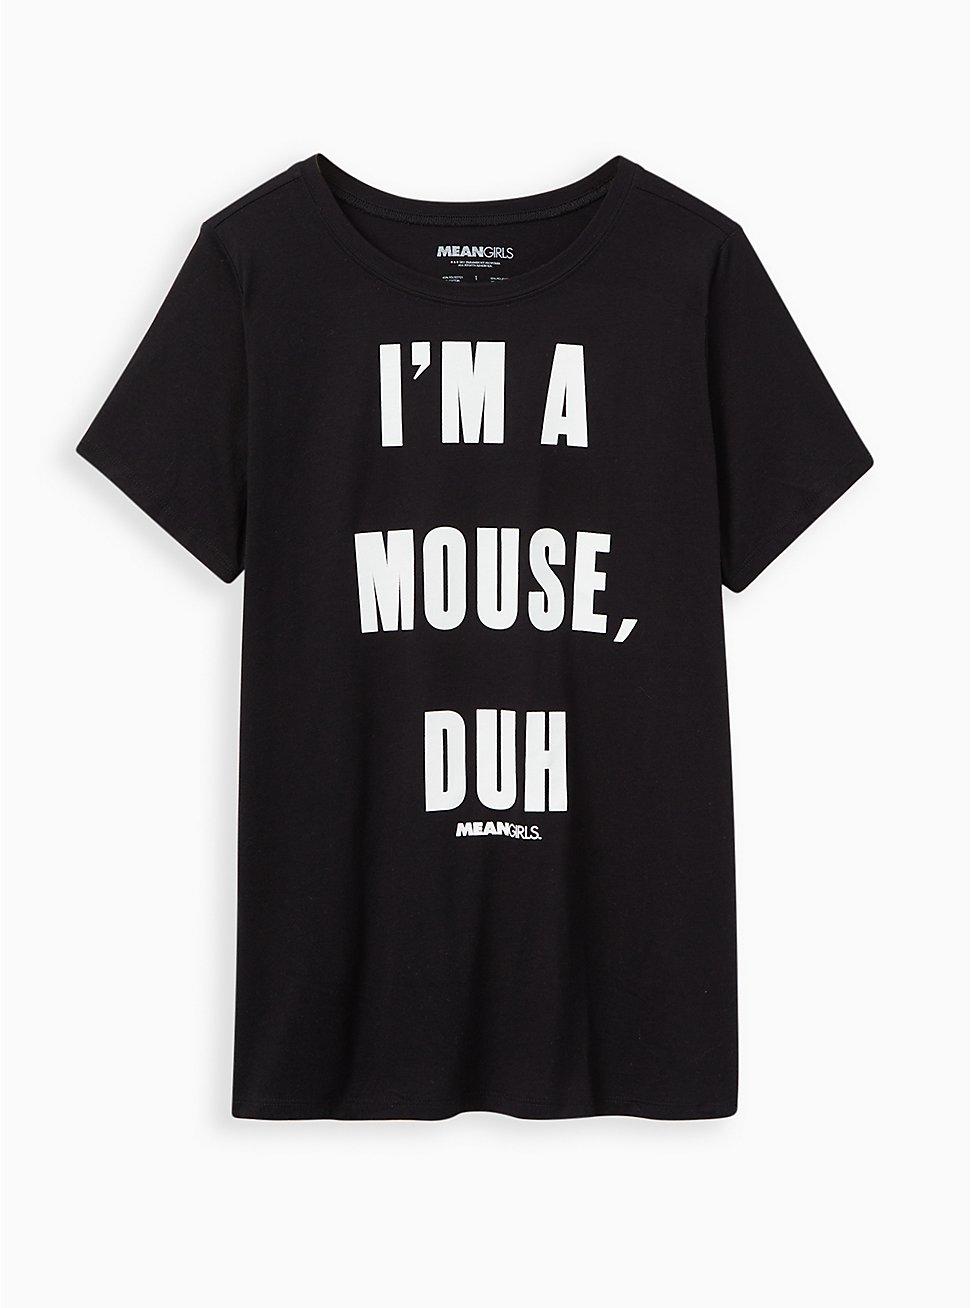 Slim Fit Crew Tee - Signature Jersey Mean Girls Mouse, Duh Black, DEEP BLACK, hi-res